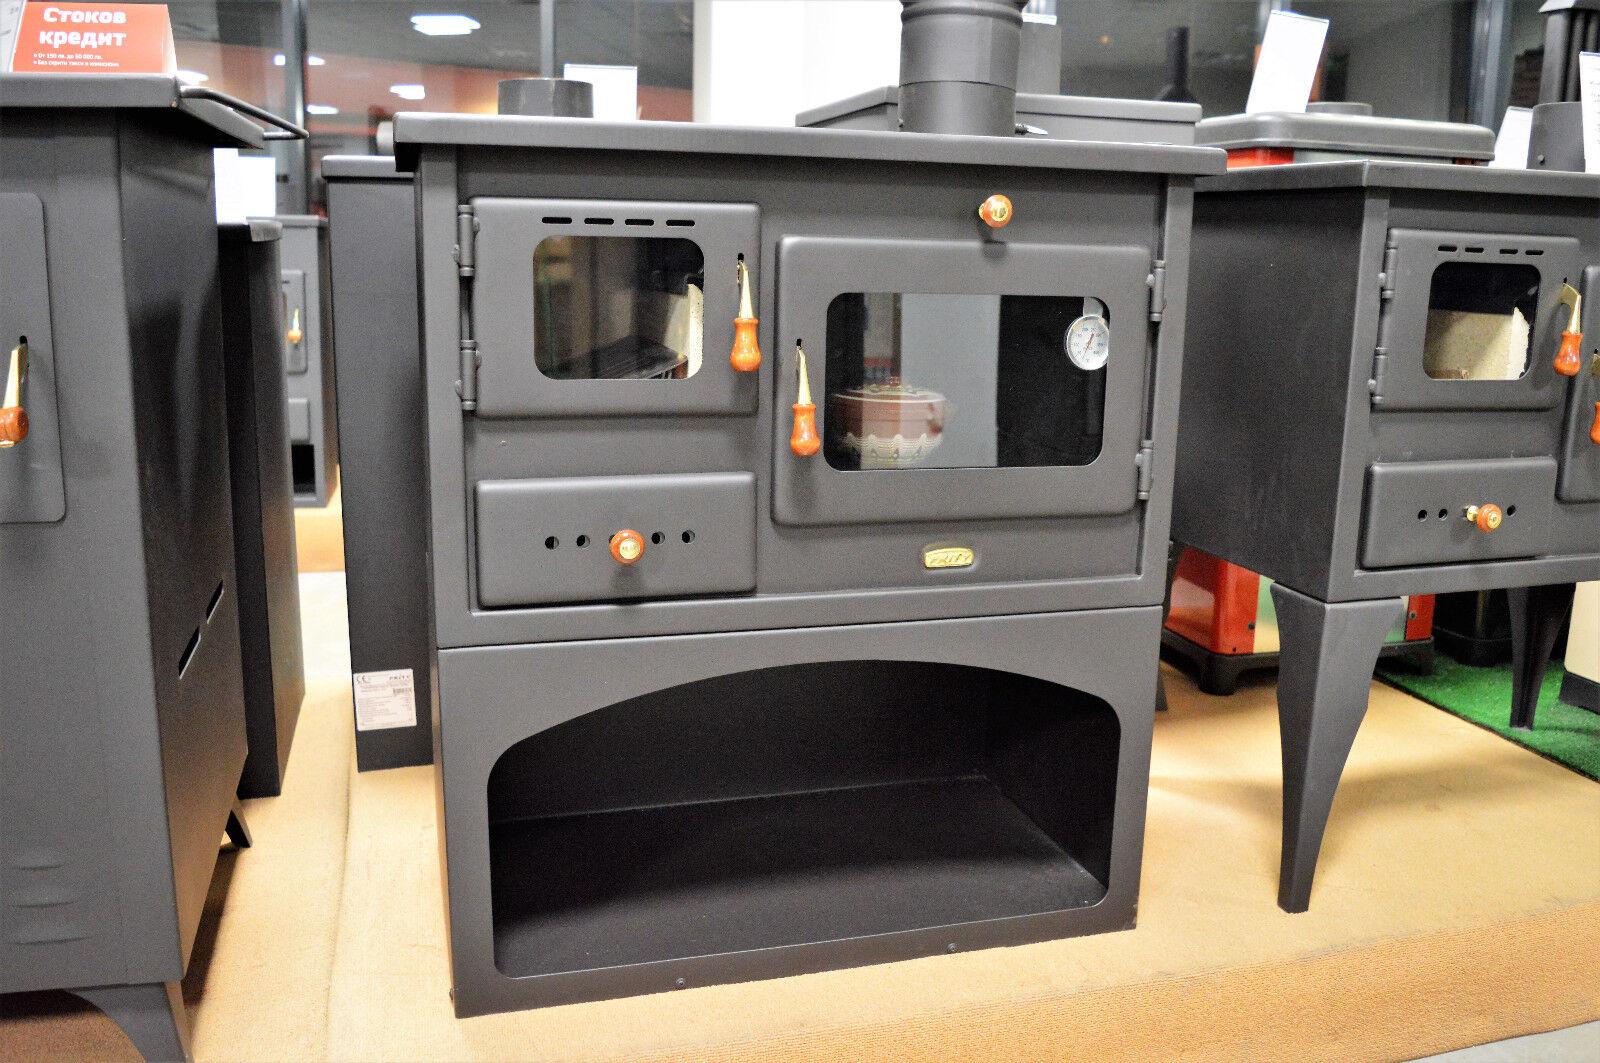 Estufa de le a hierro fundido top macizo combustible horno for Horno de hierro fundido